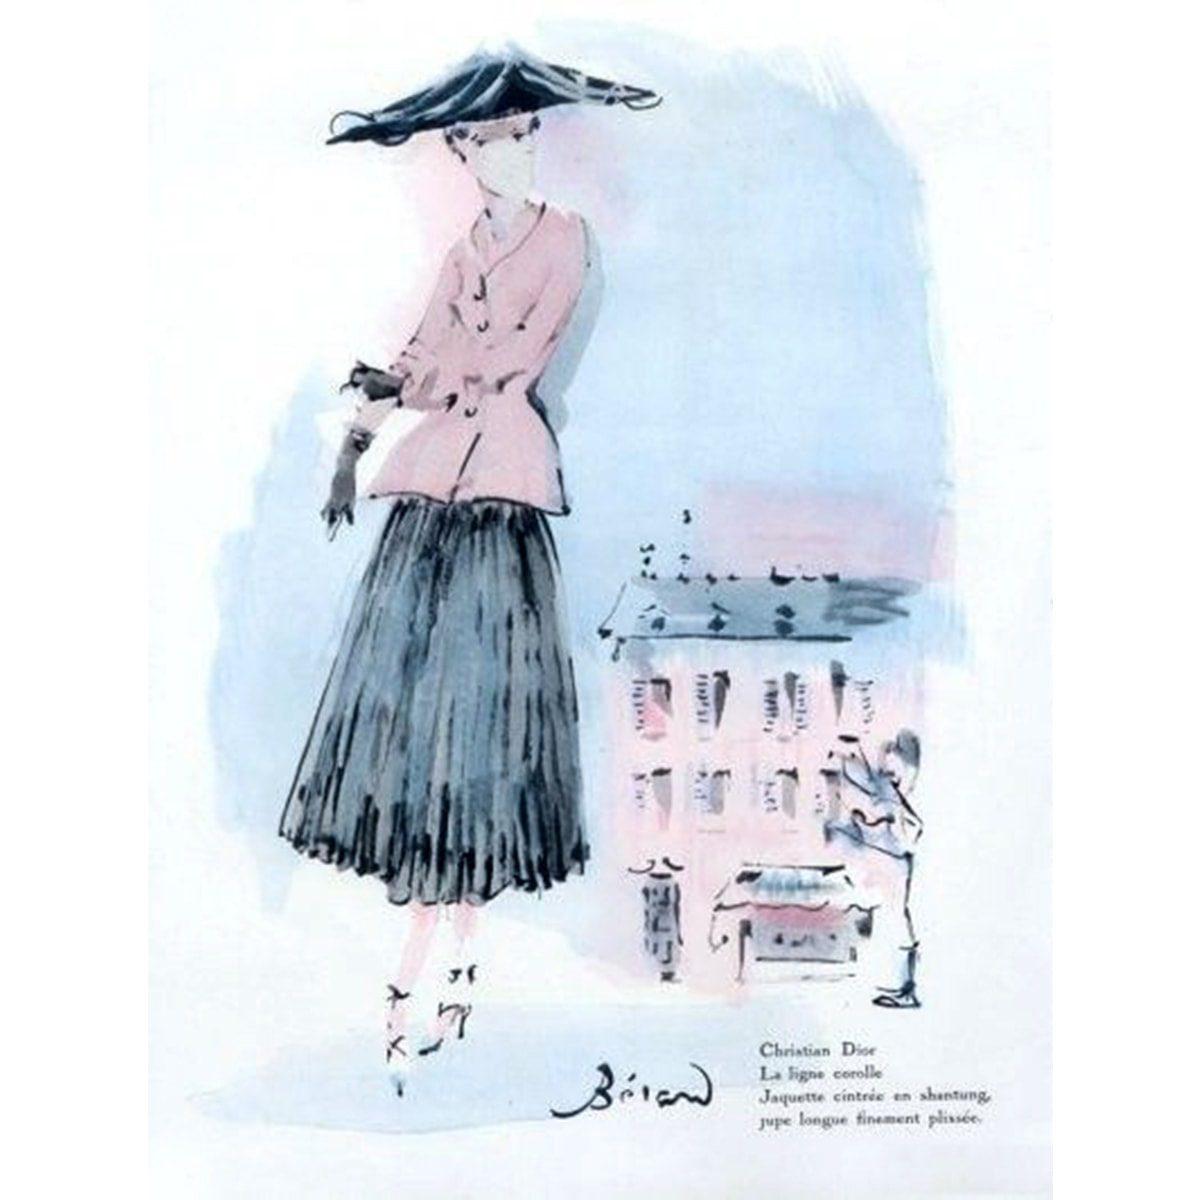 Illustration of Christian Bérard 1947 for Christian Dior